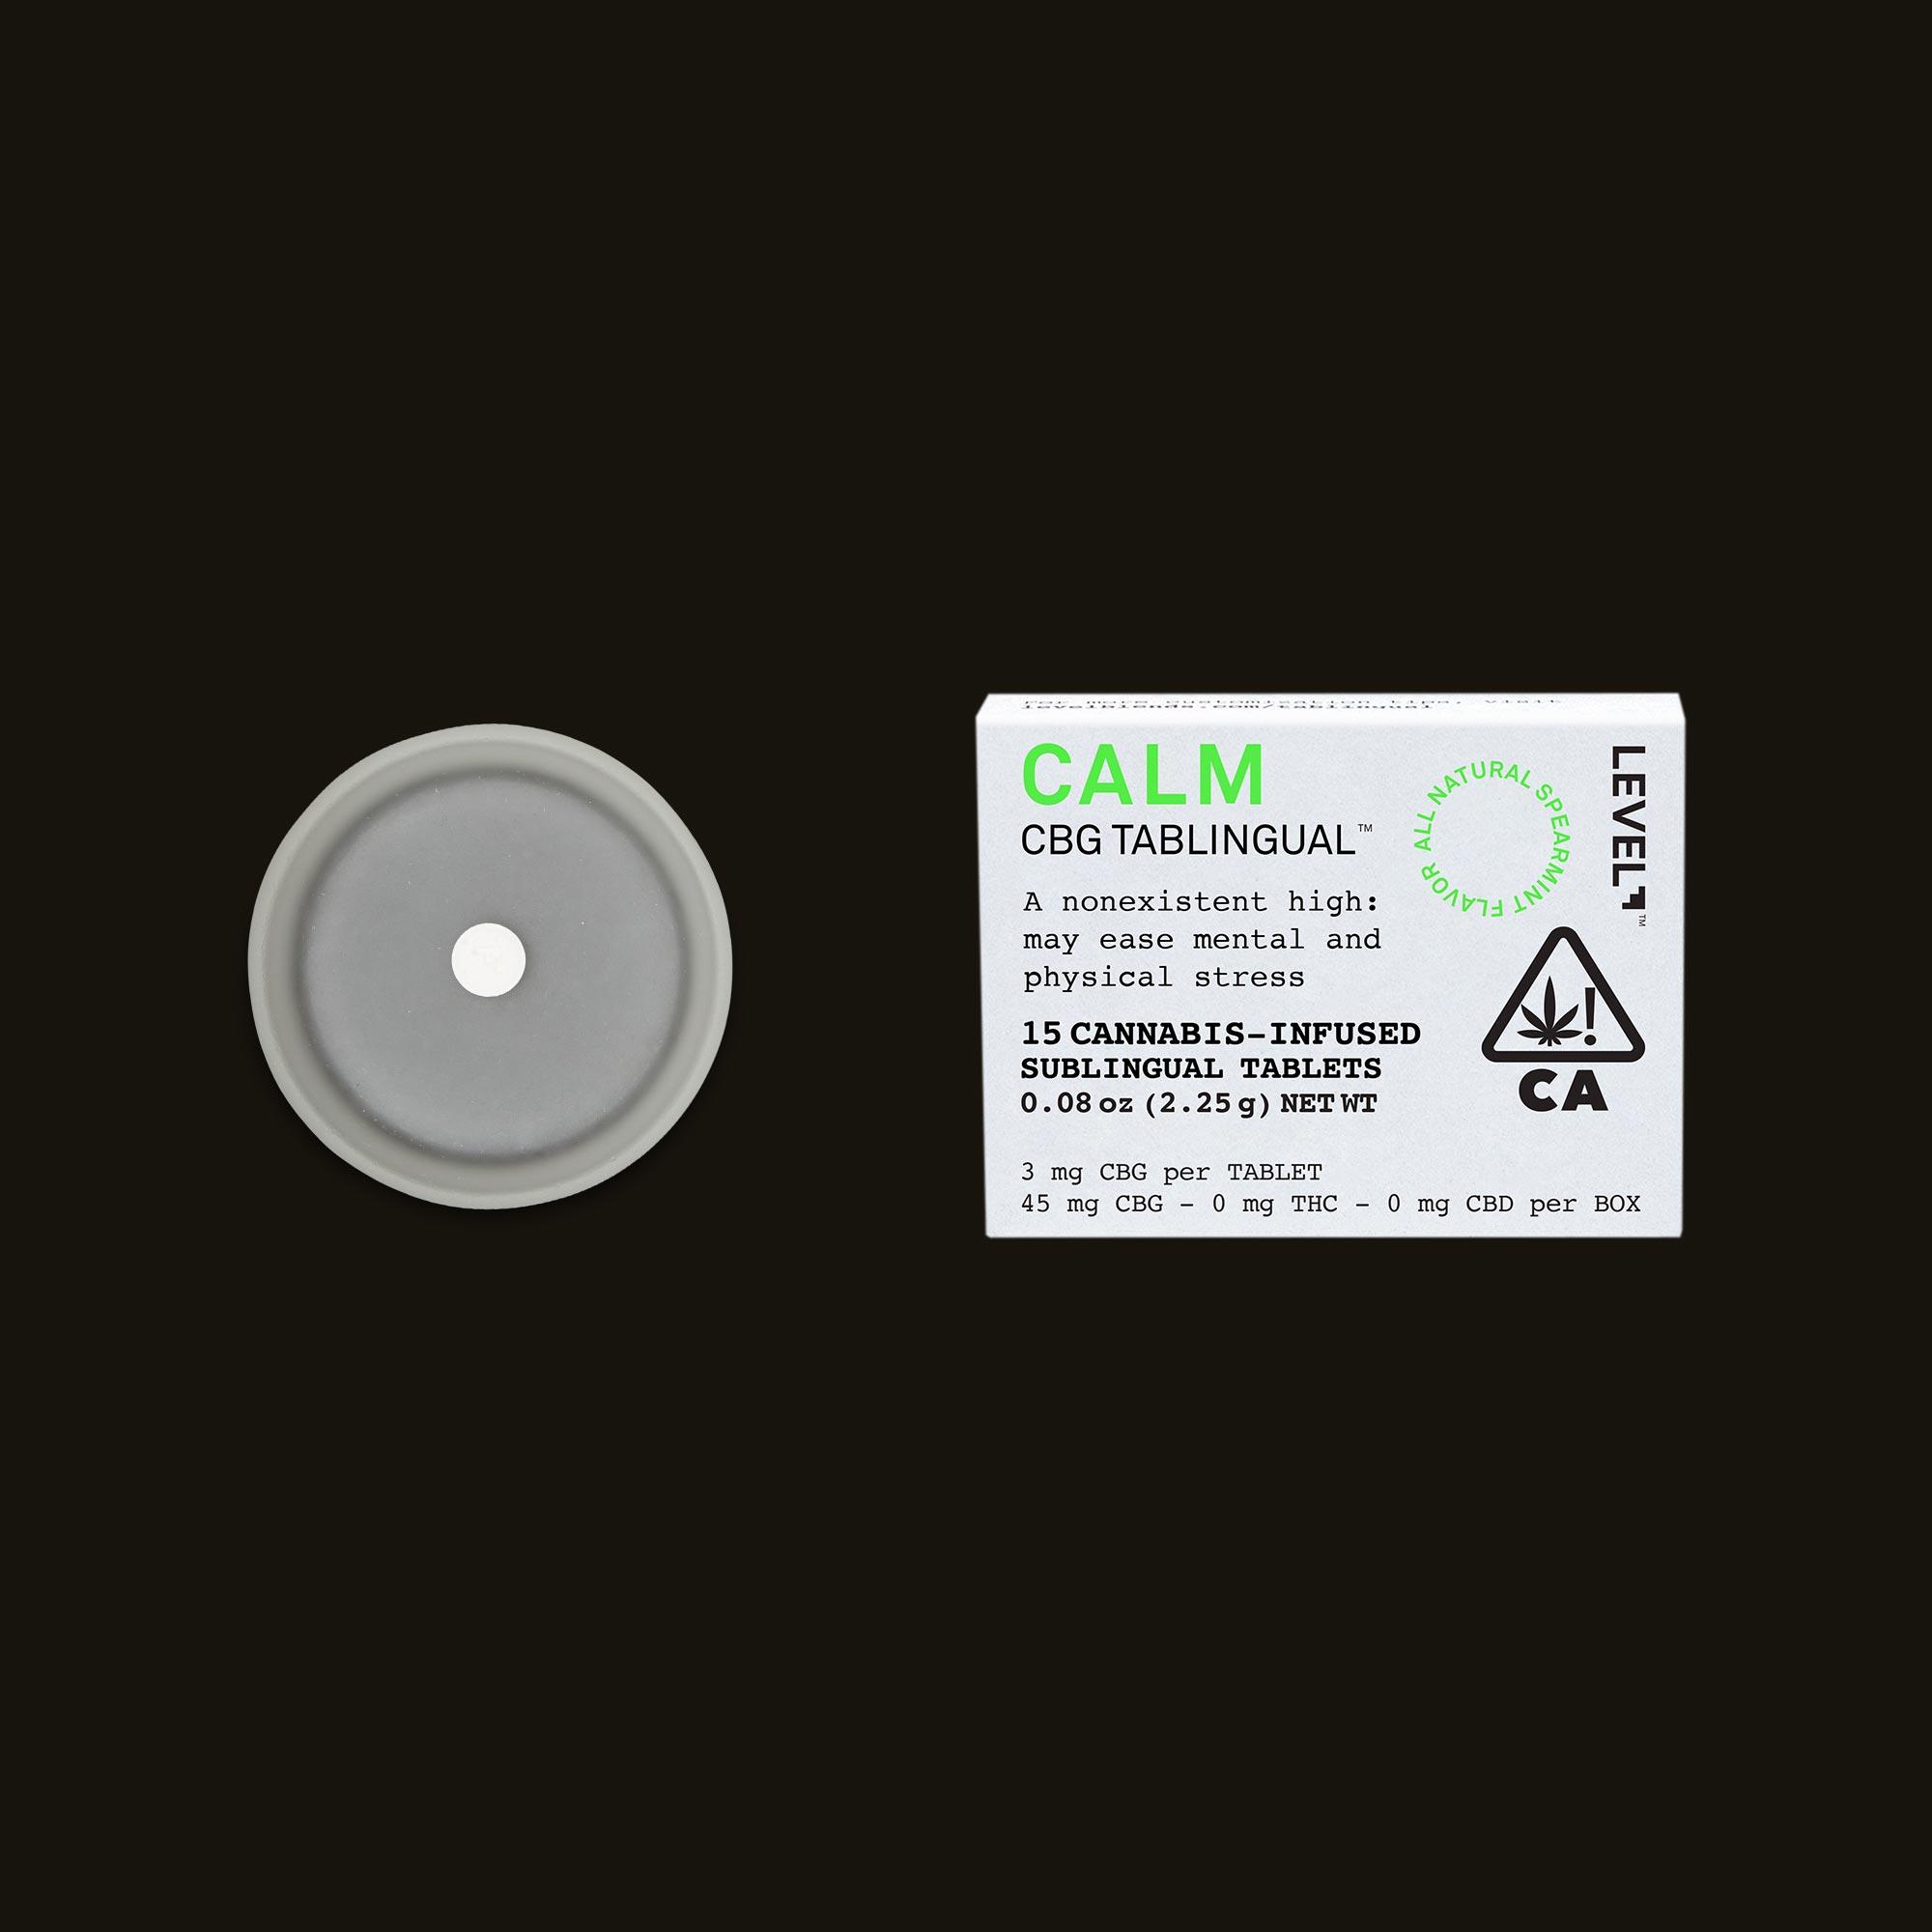 Calm Tablingual by LEVEL